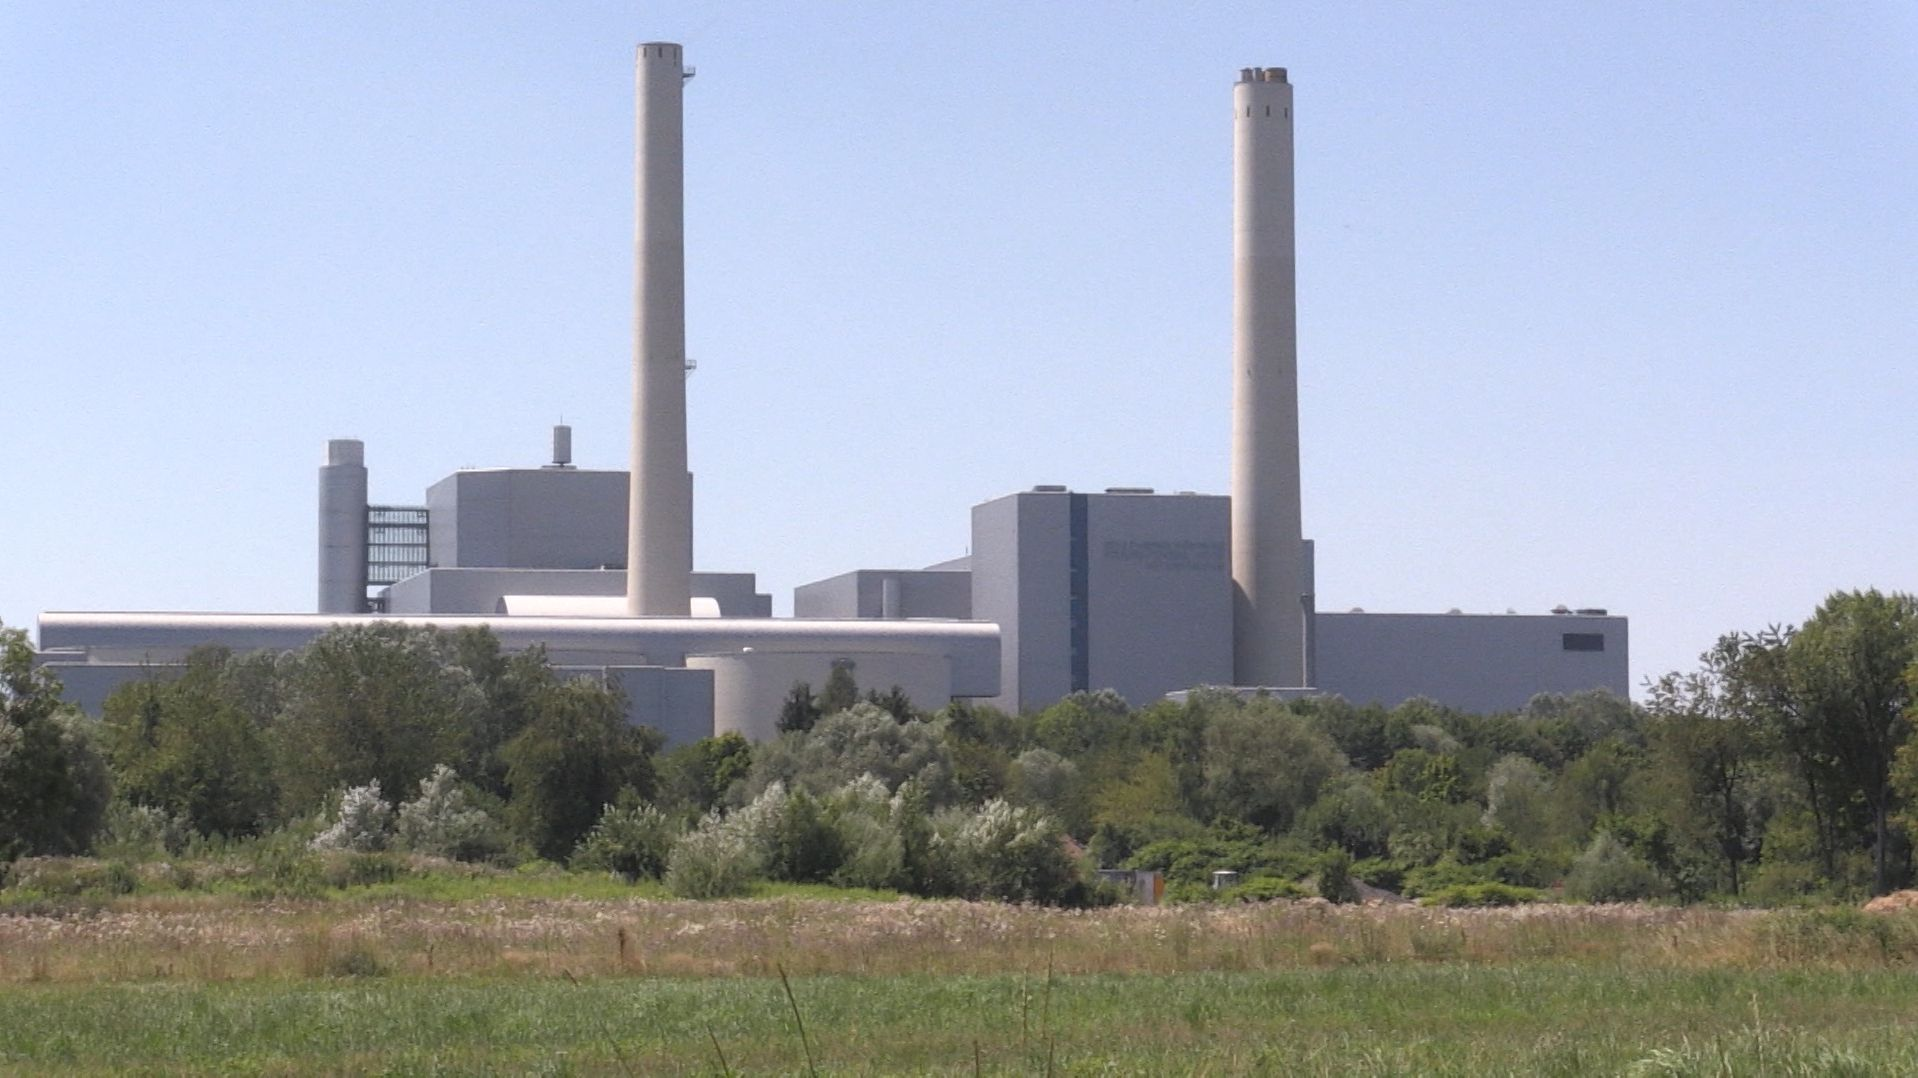 Stadtrat kippt Beschluss: Münchner Kohleausstieg doch möglich